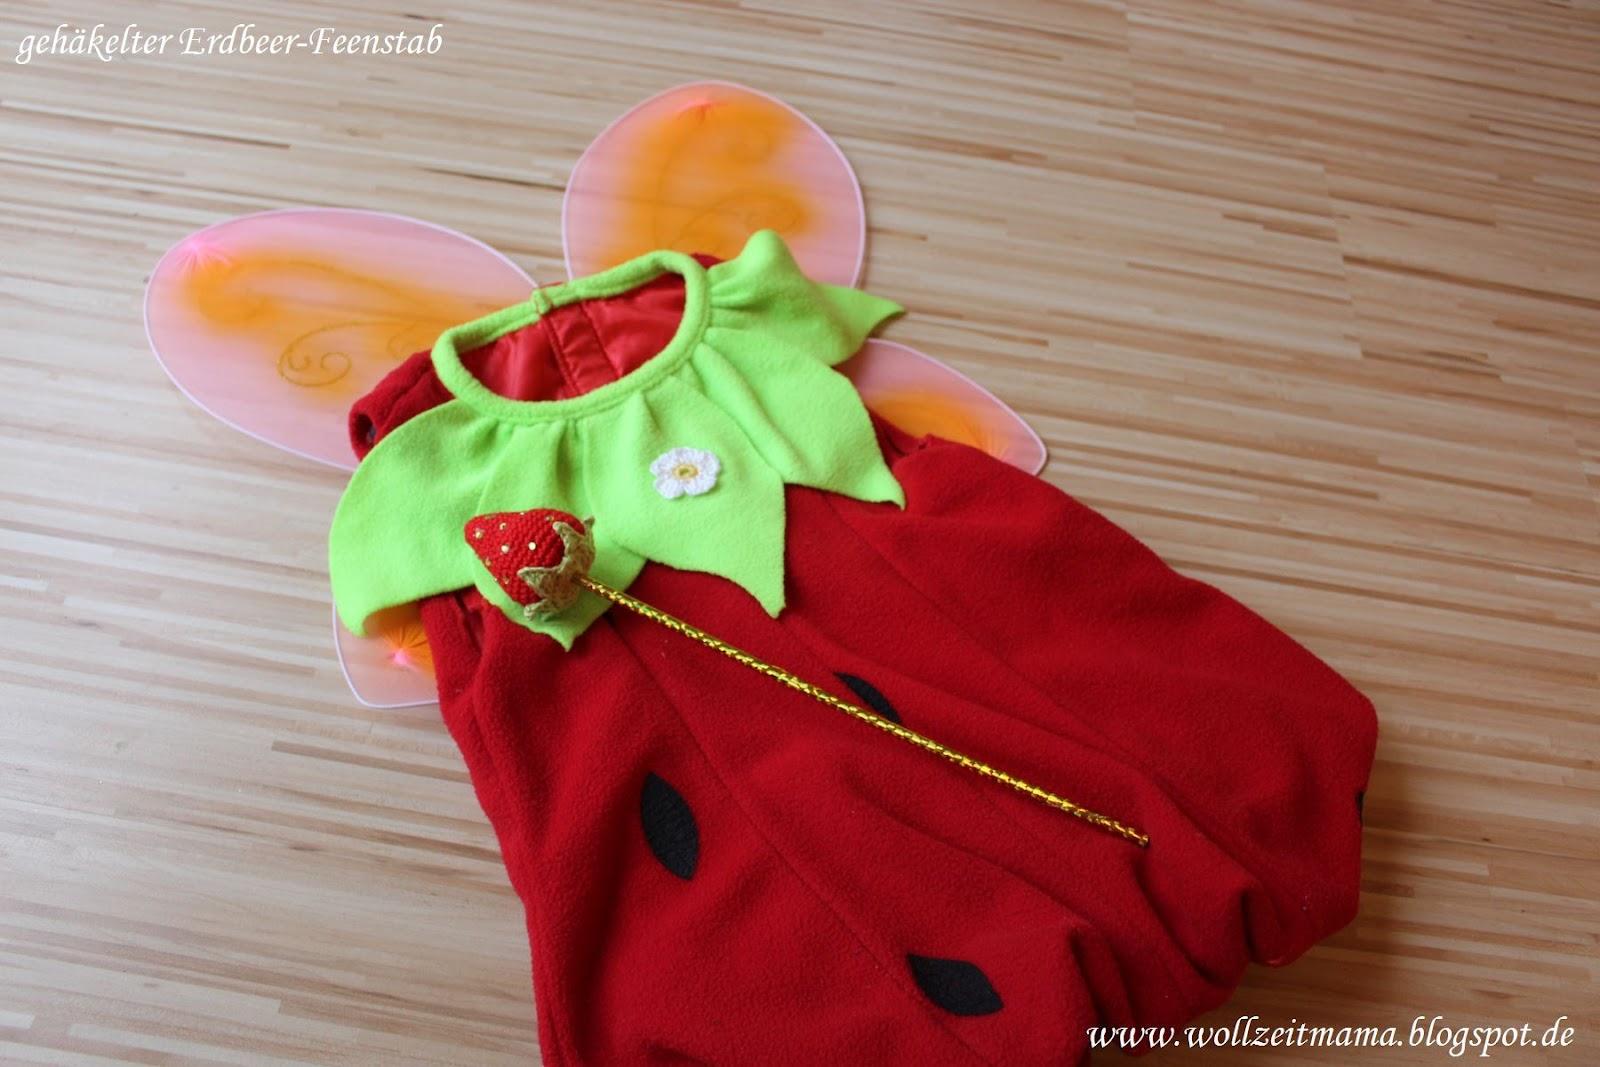 Wollzeitmama Diy Erdbeer Feenstab Zum Fasching Selber Machen